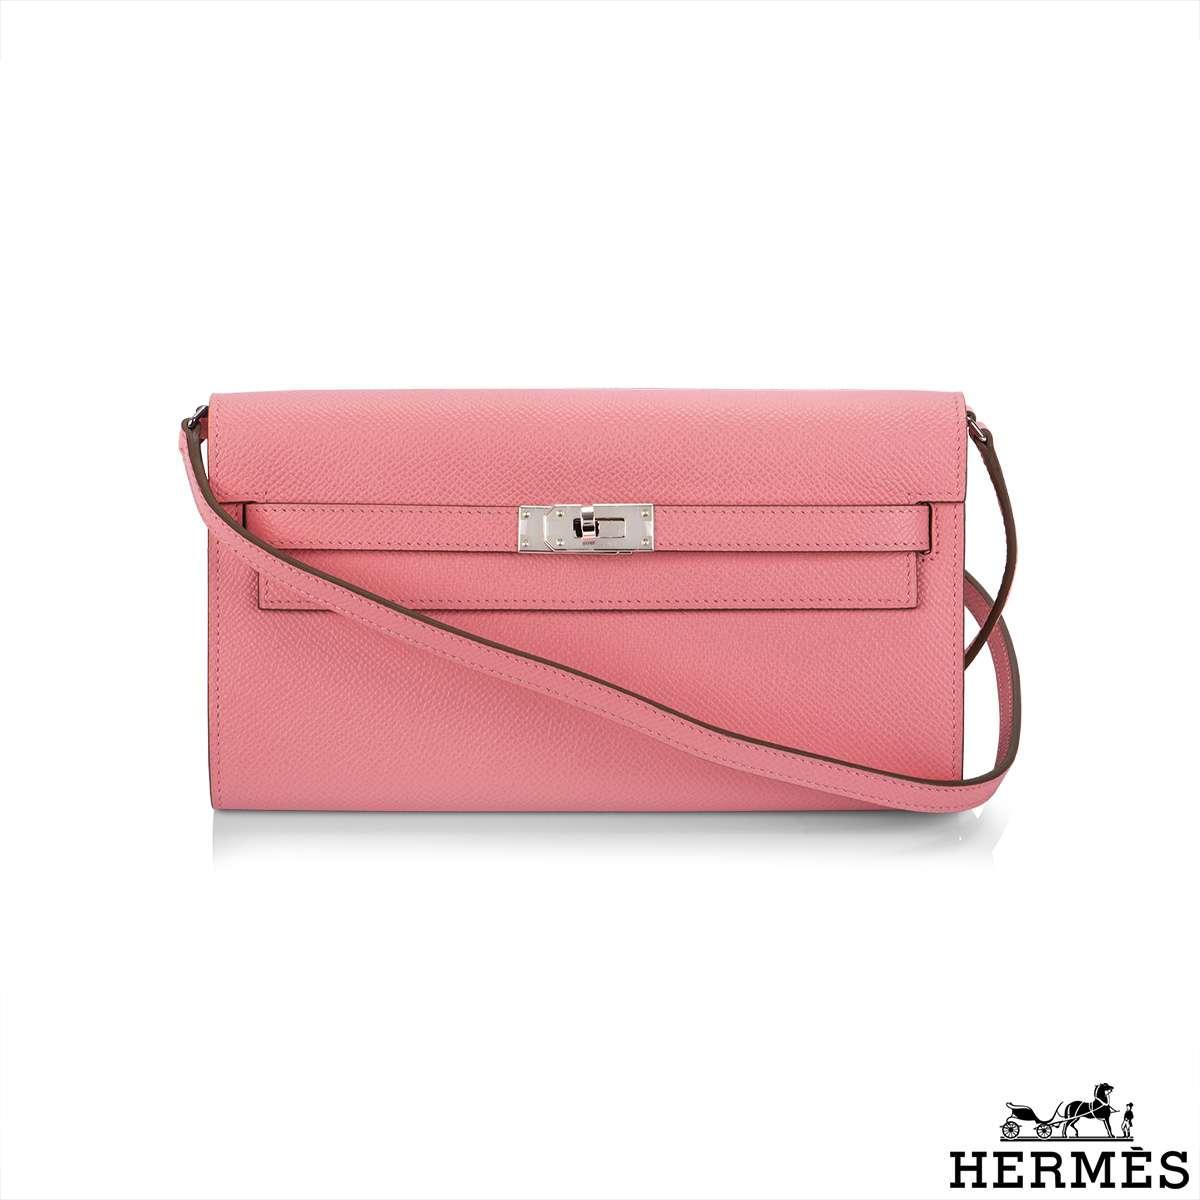 Hermès Rose Confetti Epsom Kelly Wallet To Go PHW